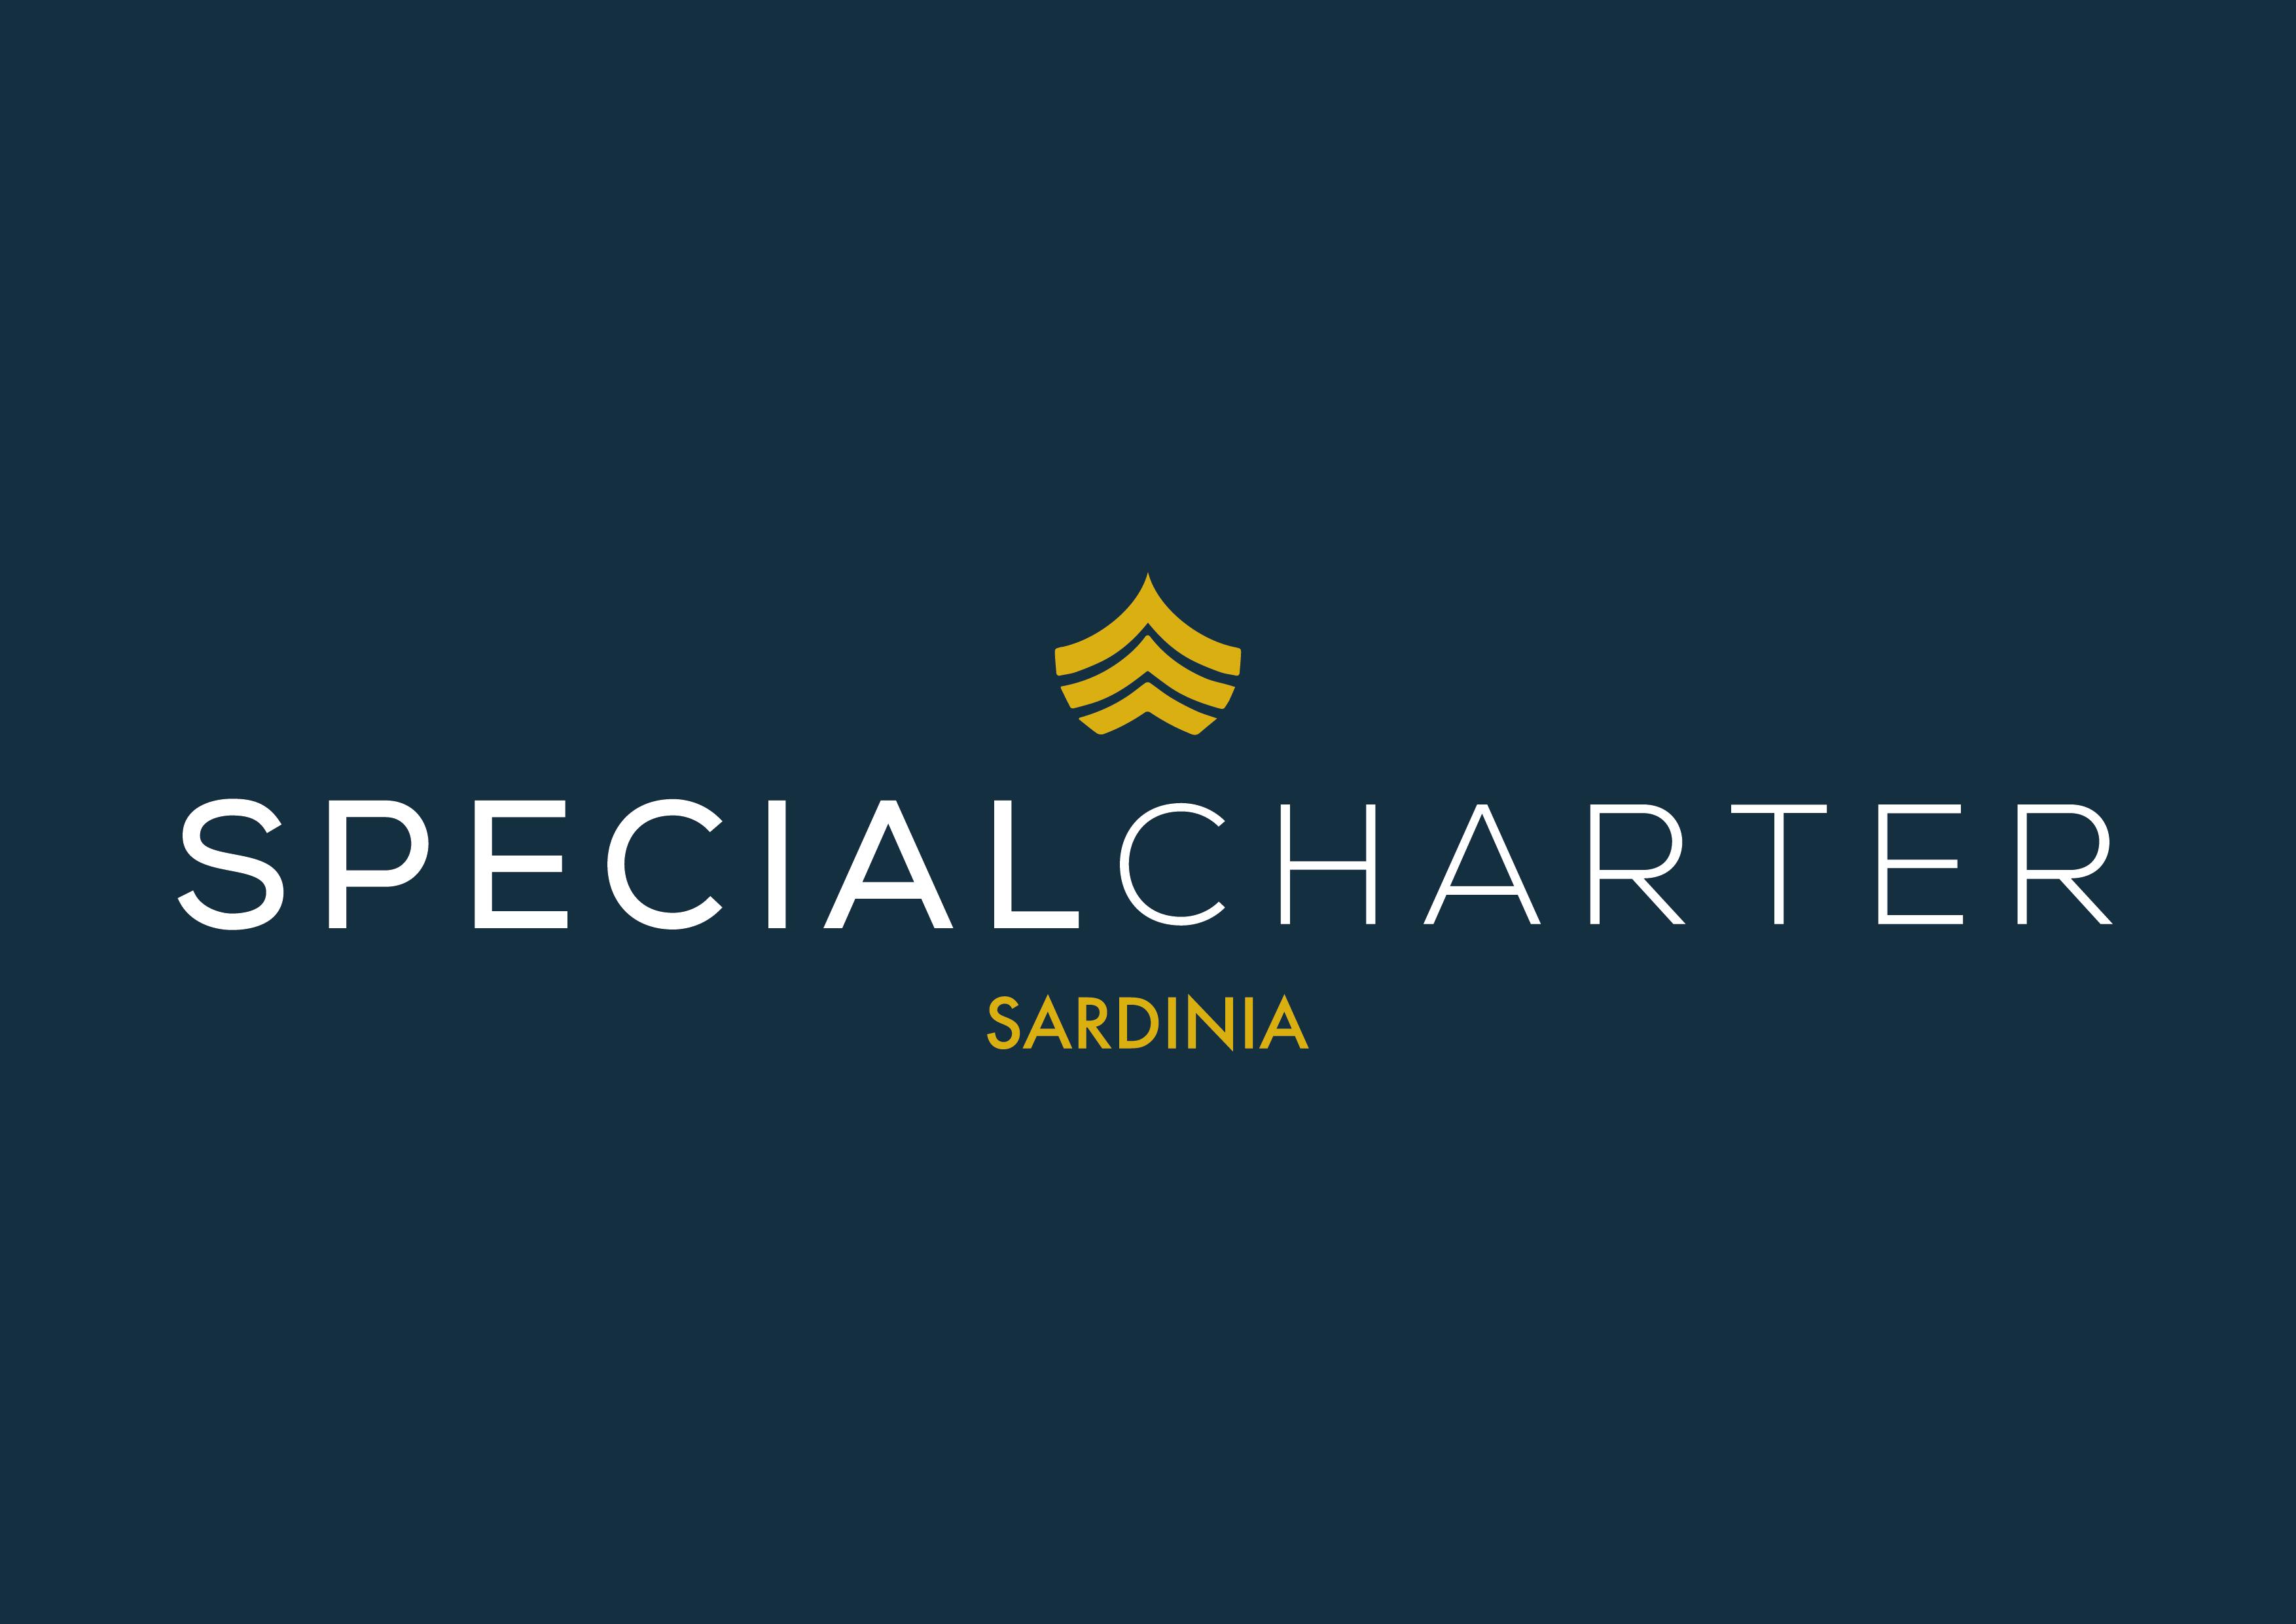 Special Charter Sardinia Company Logo 2